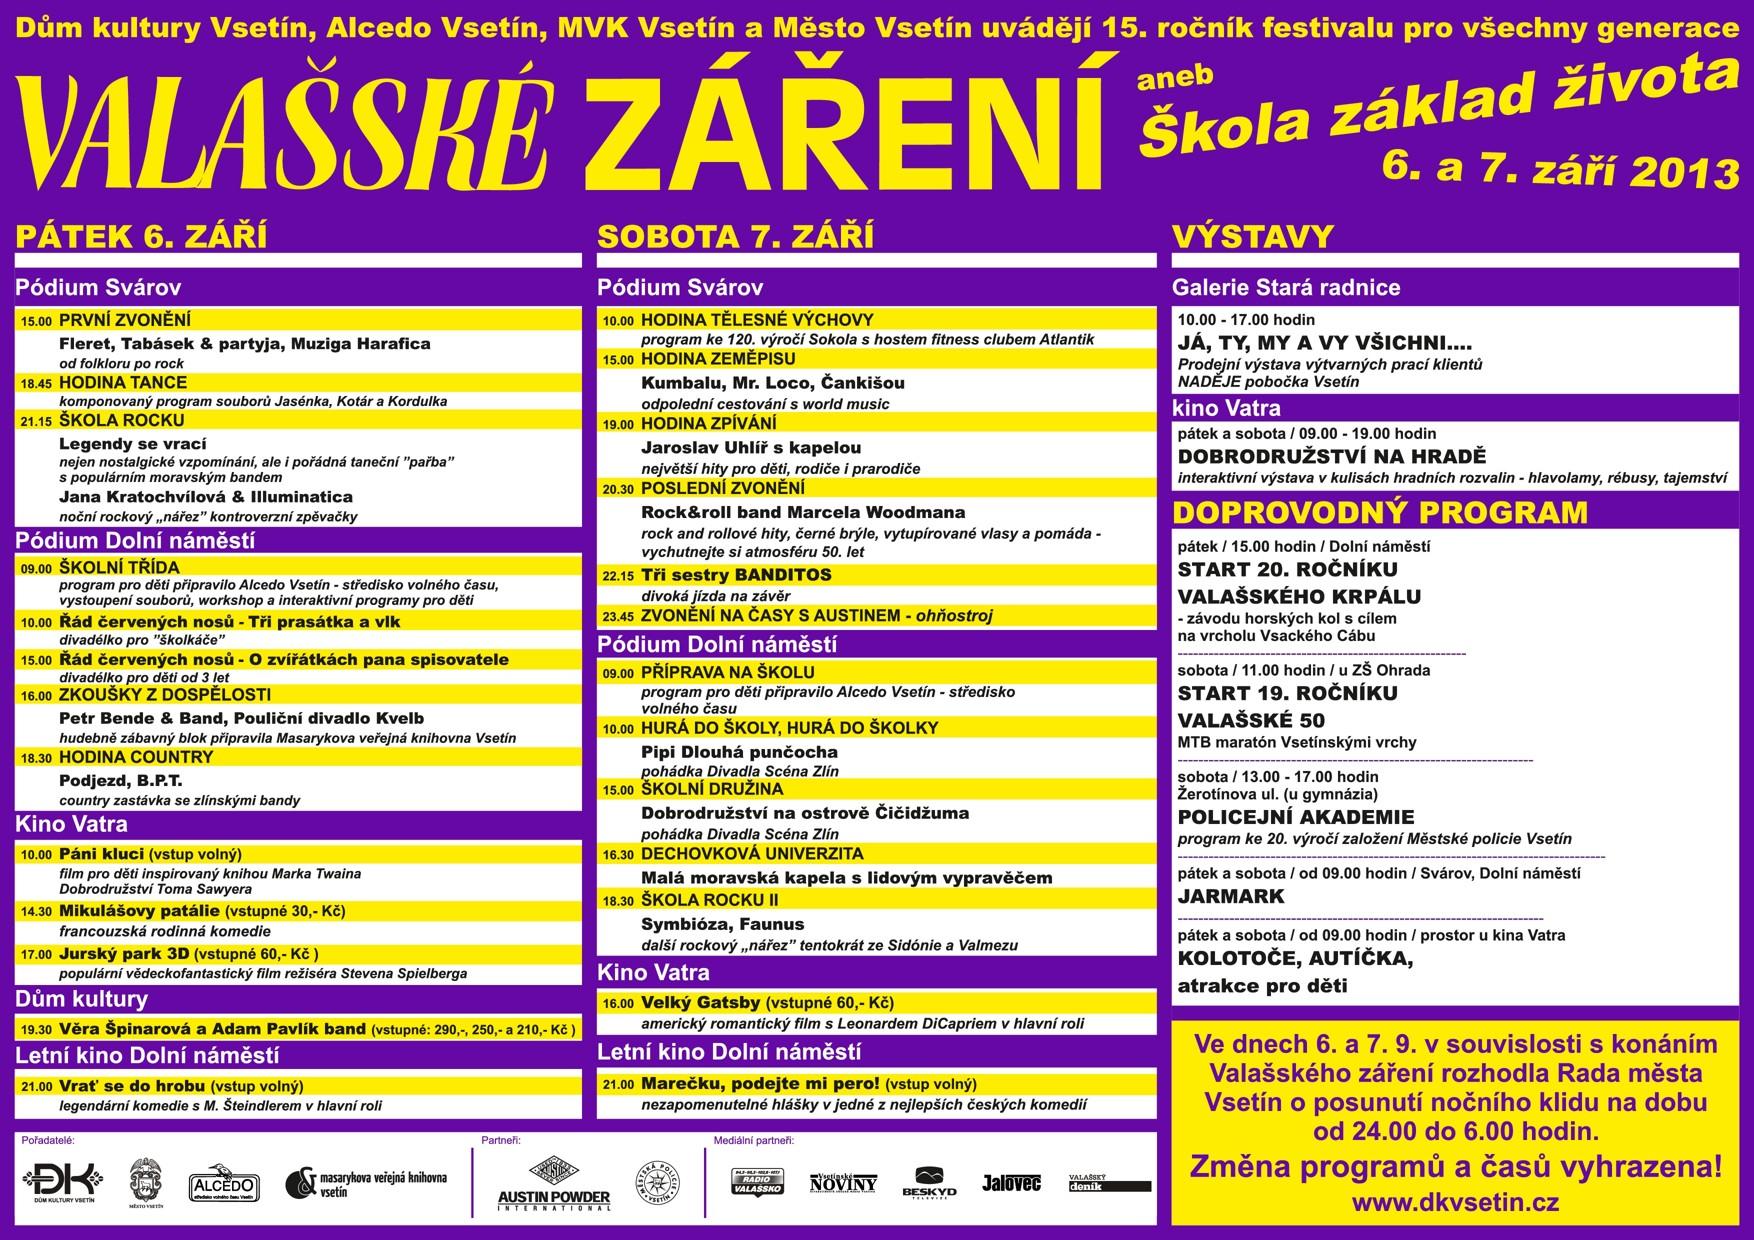 valasske_zareni_-_prgm_final-001_-_kopie